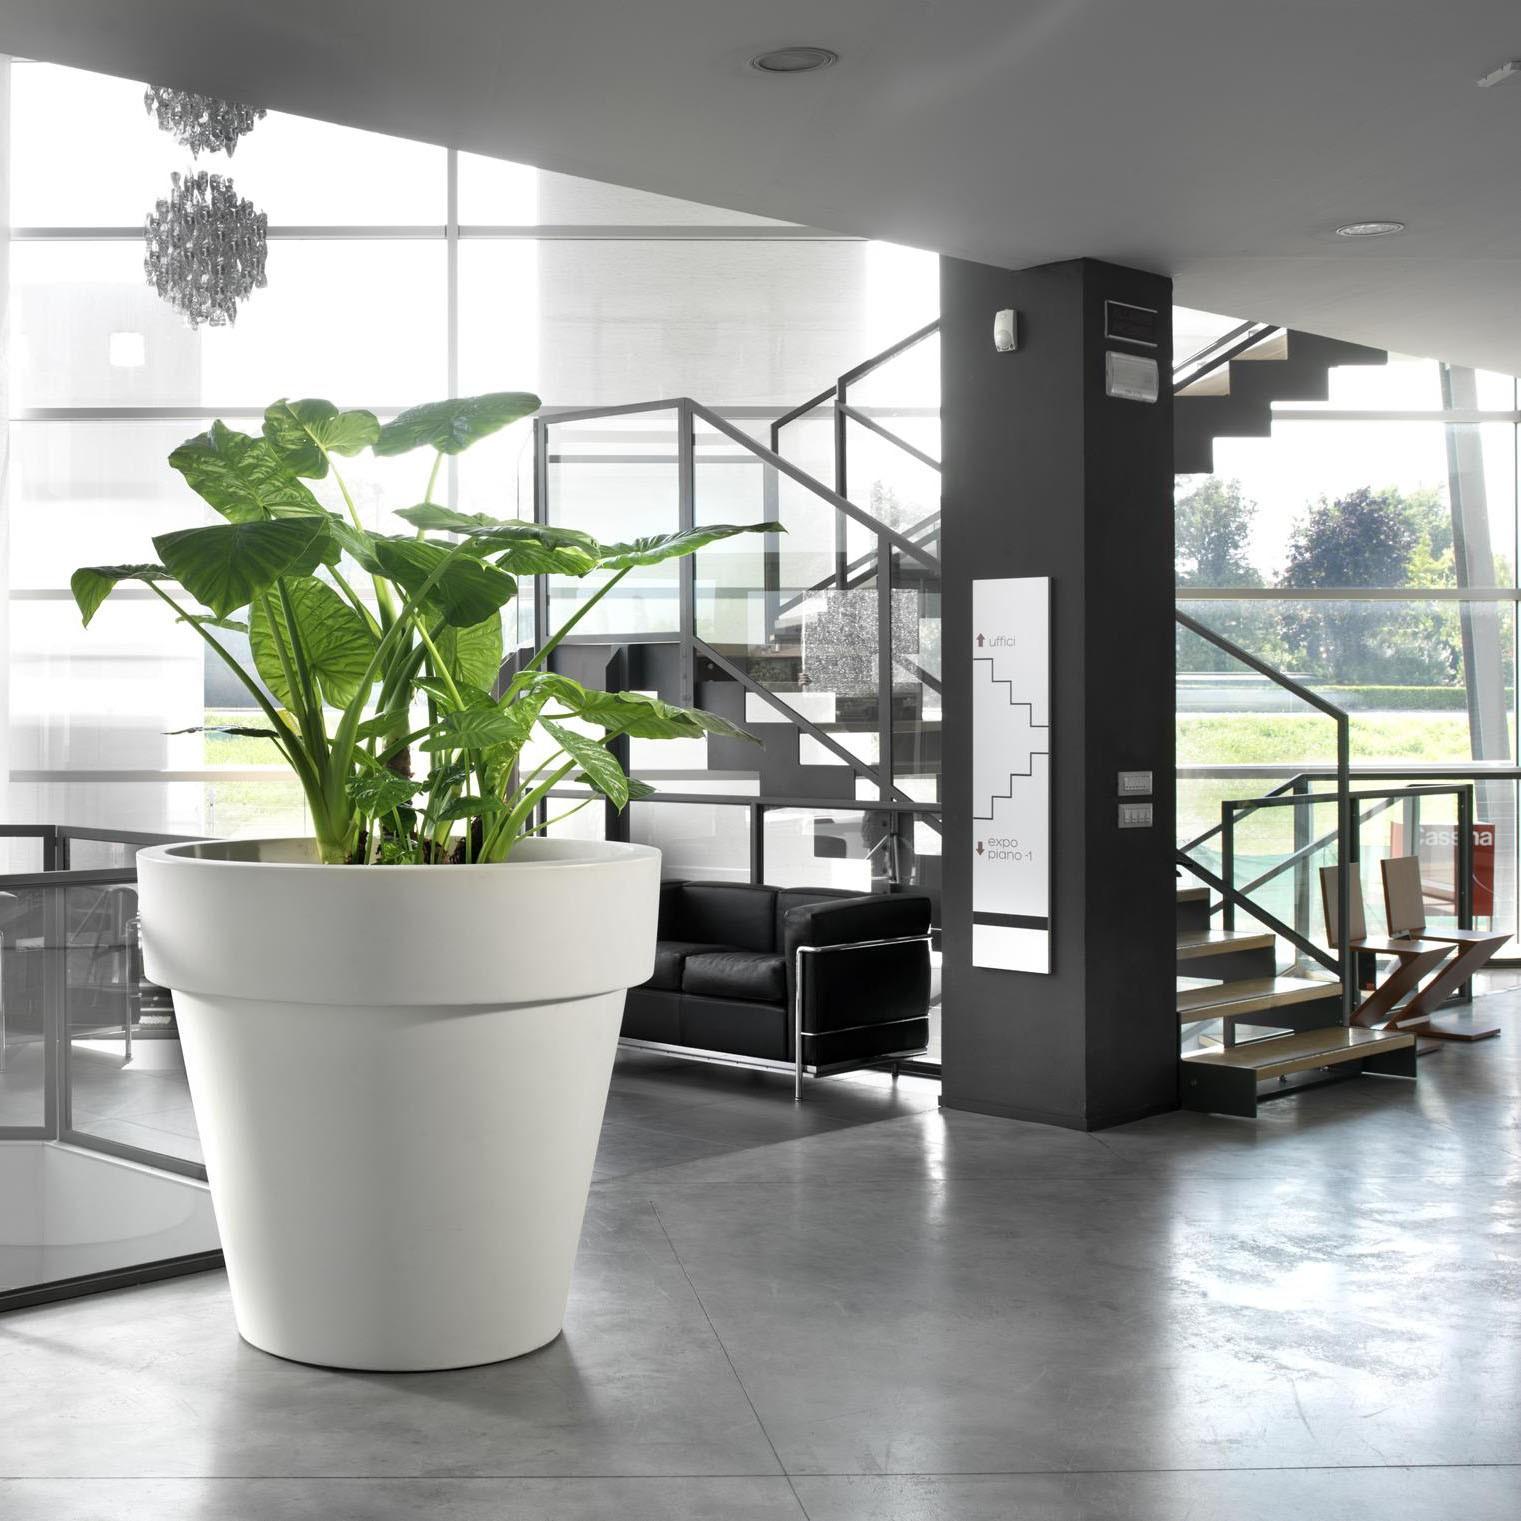 Vaso esterno grandi dimensioni standard one vendita online for Vasi esterno